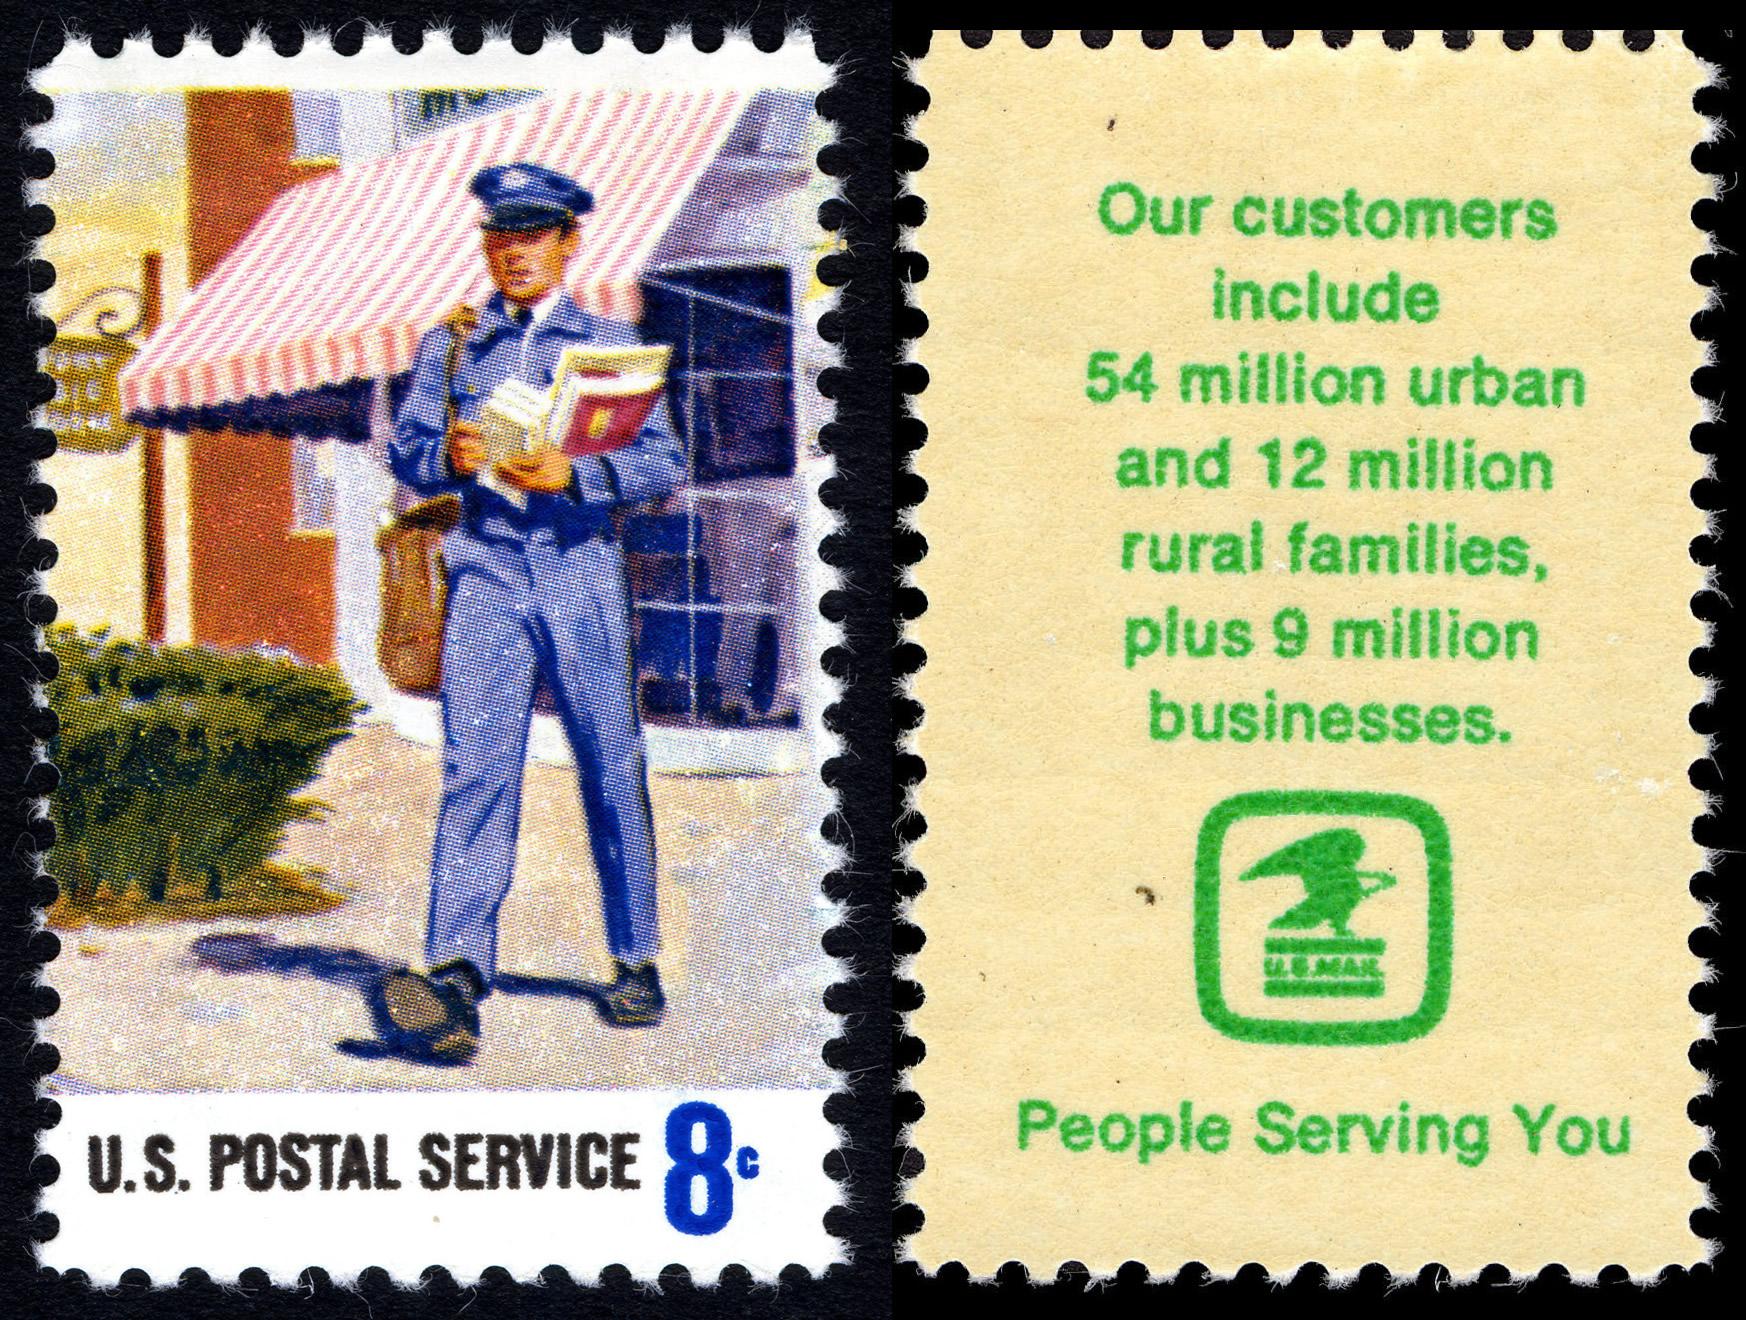 File:Postal Service Employees   Mailman   8c 1973 Issue U.S. Stamp